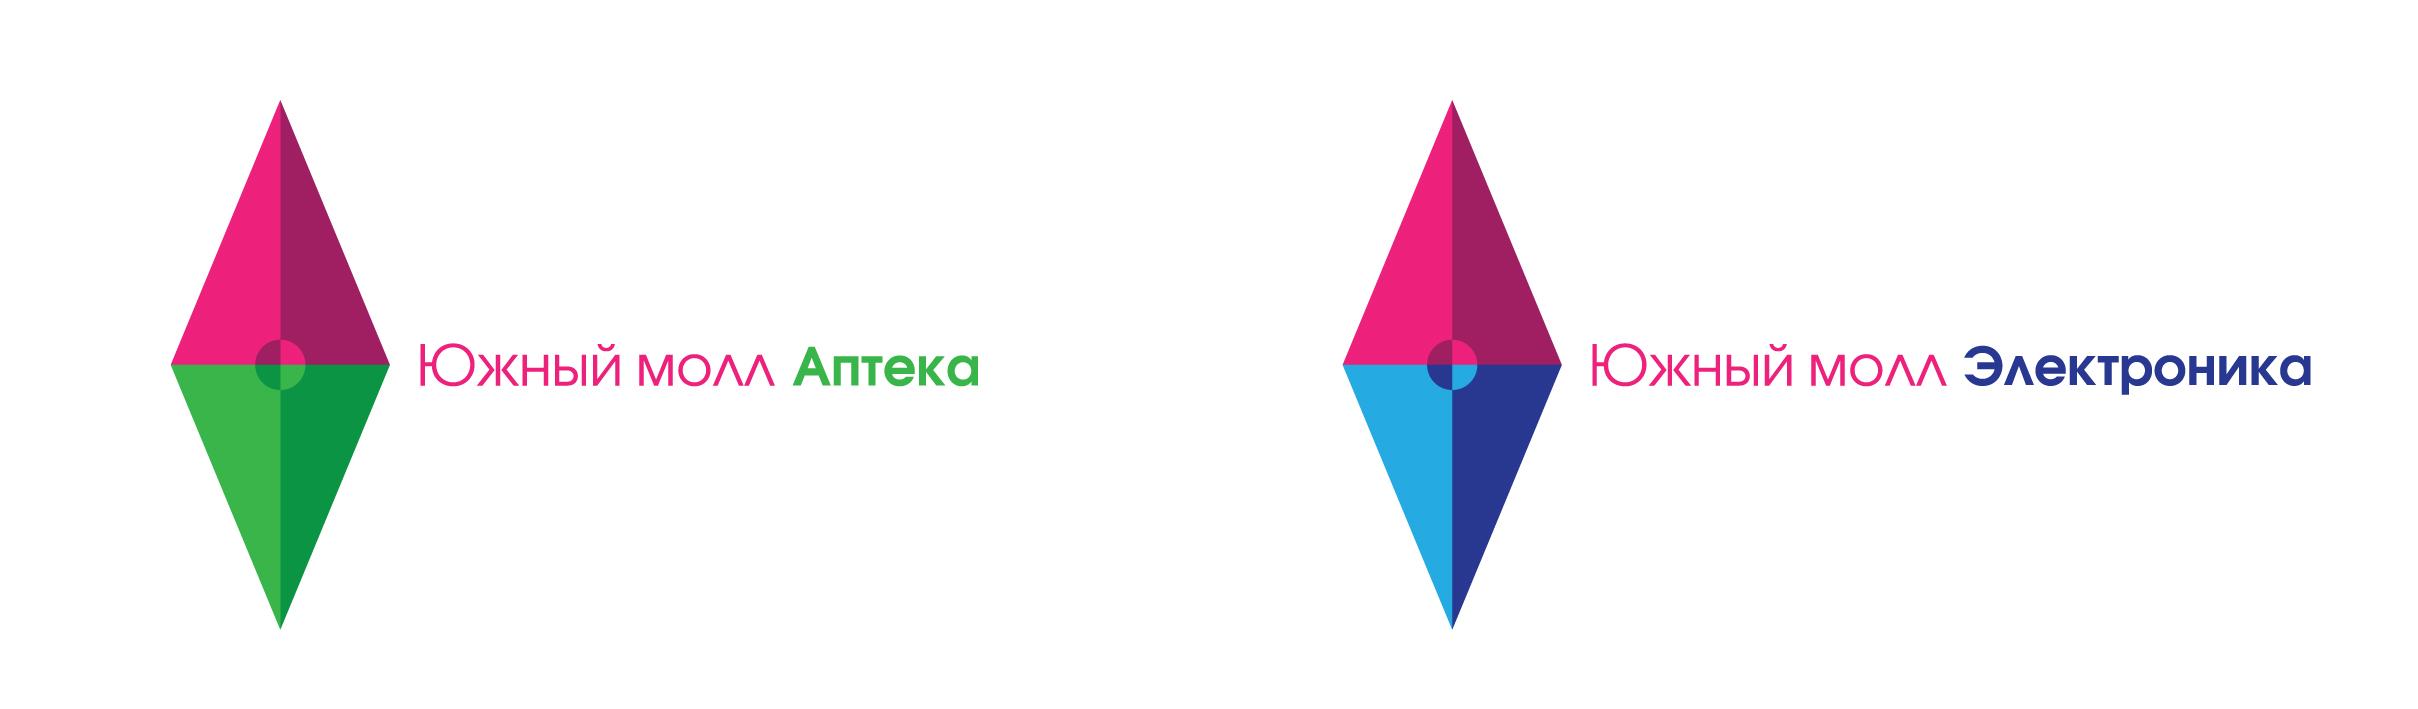 Разработка логотипа фото f_4db1a71dc9358.jpg